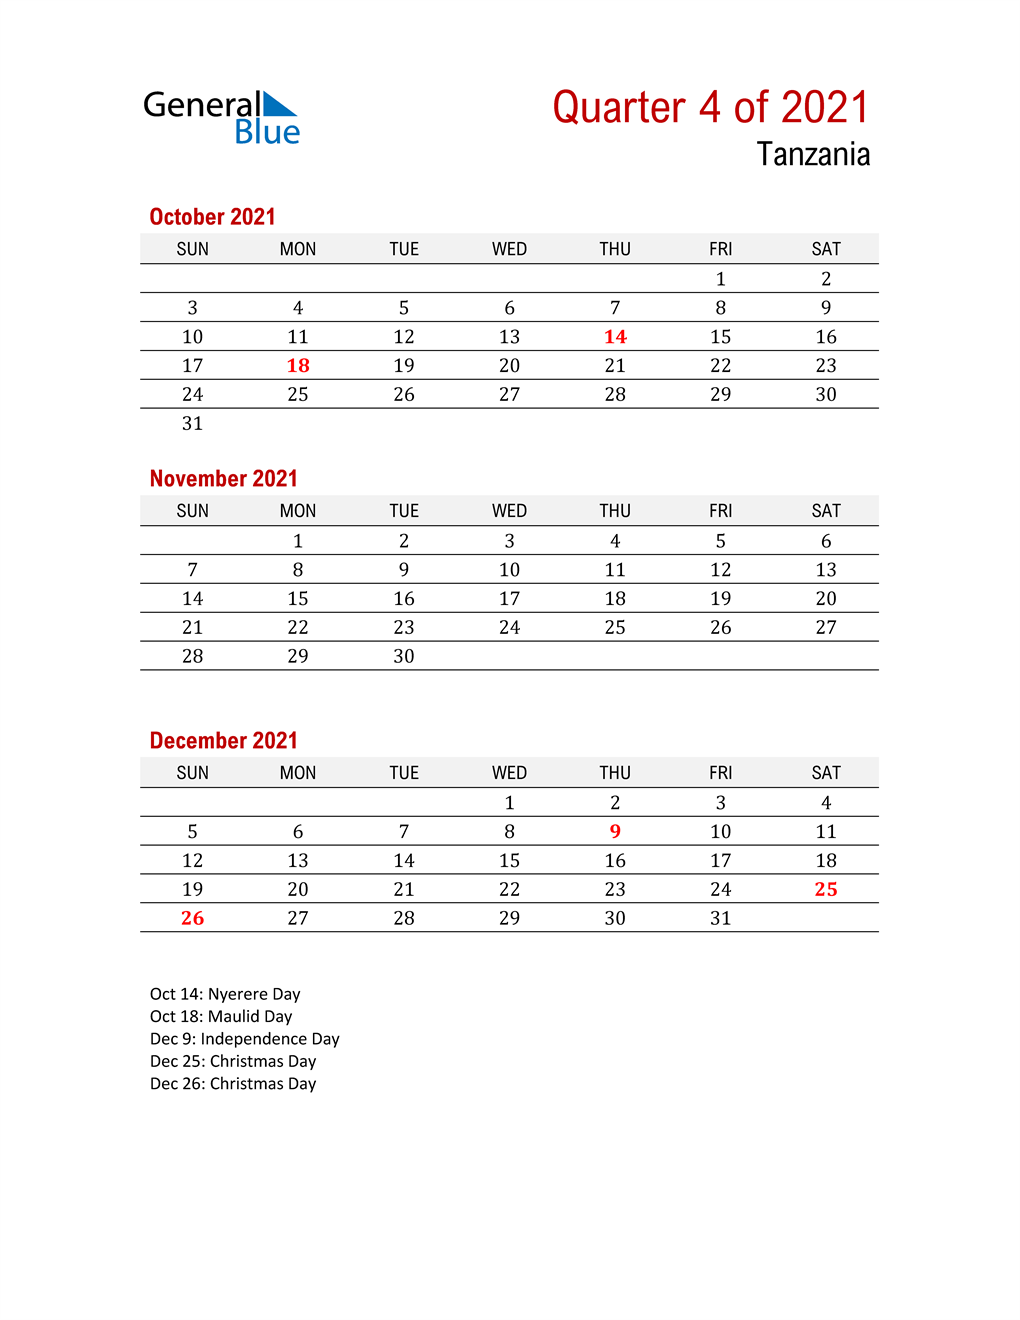 Printable Three Month Calendar for Tanzania